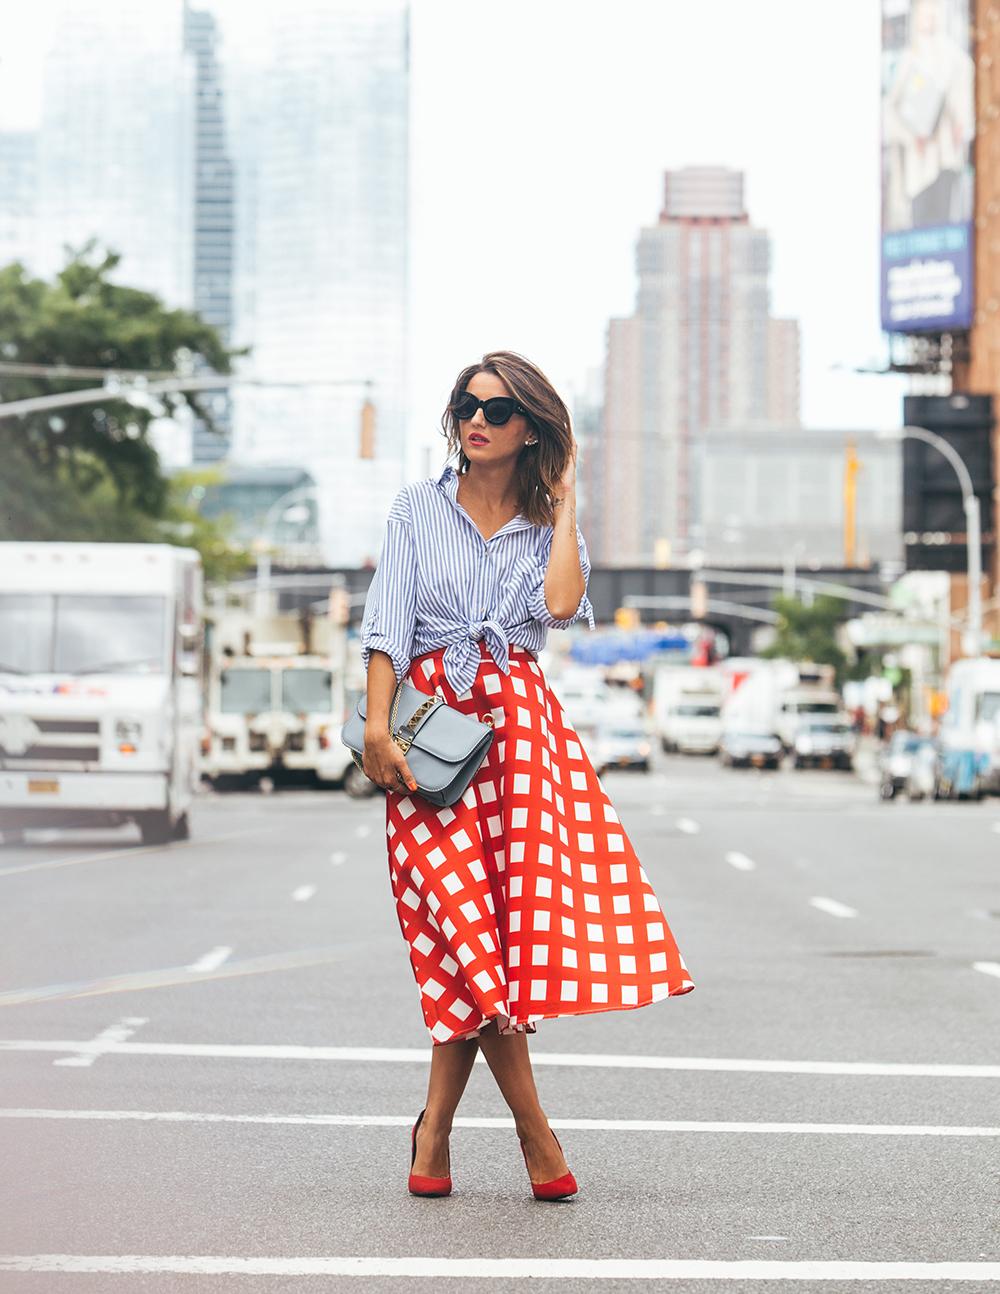 chemisier-rayures-jupe-carrés-design-moderne